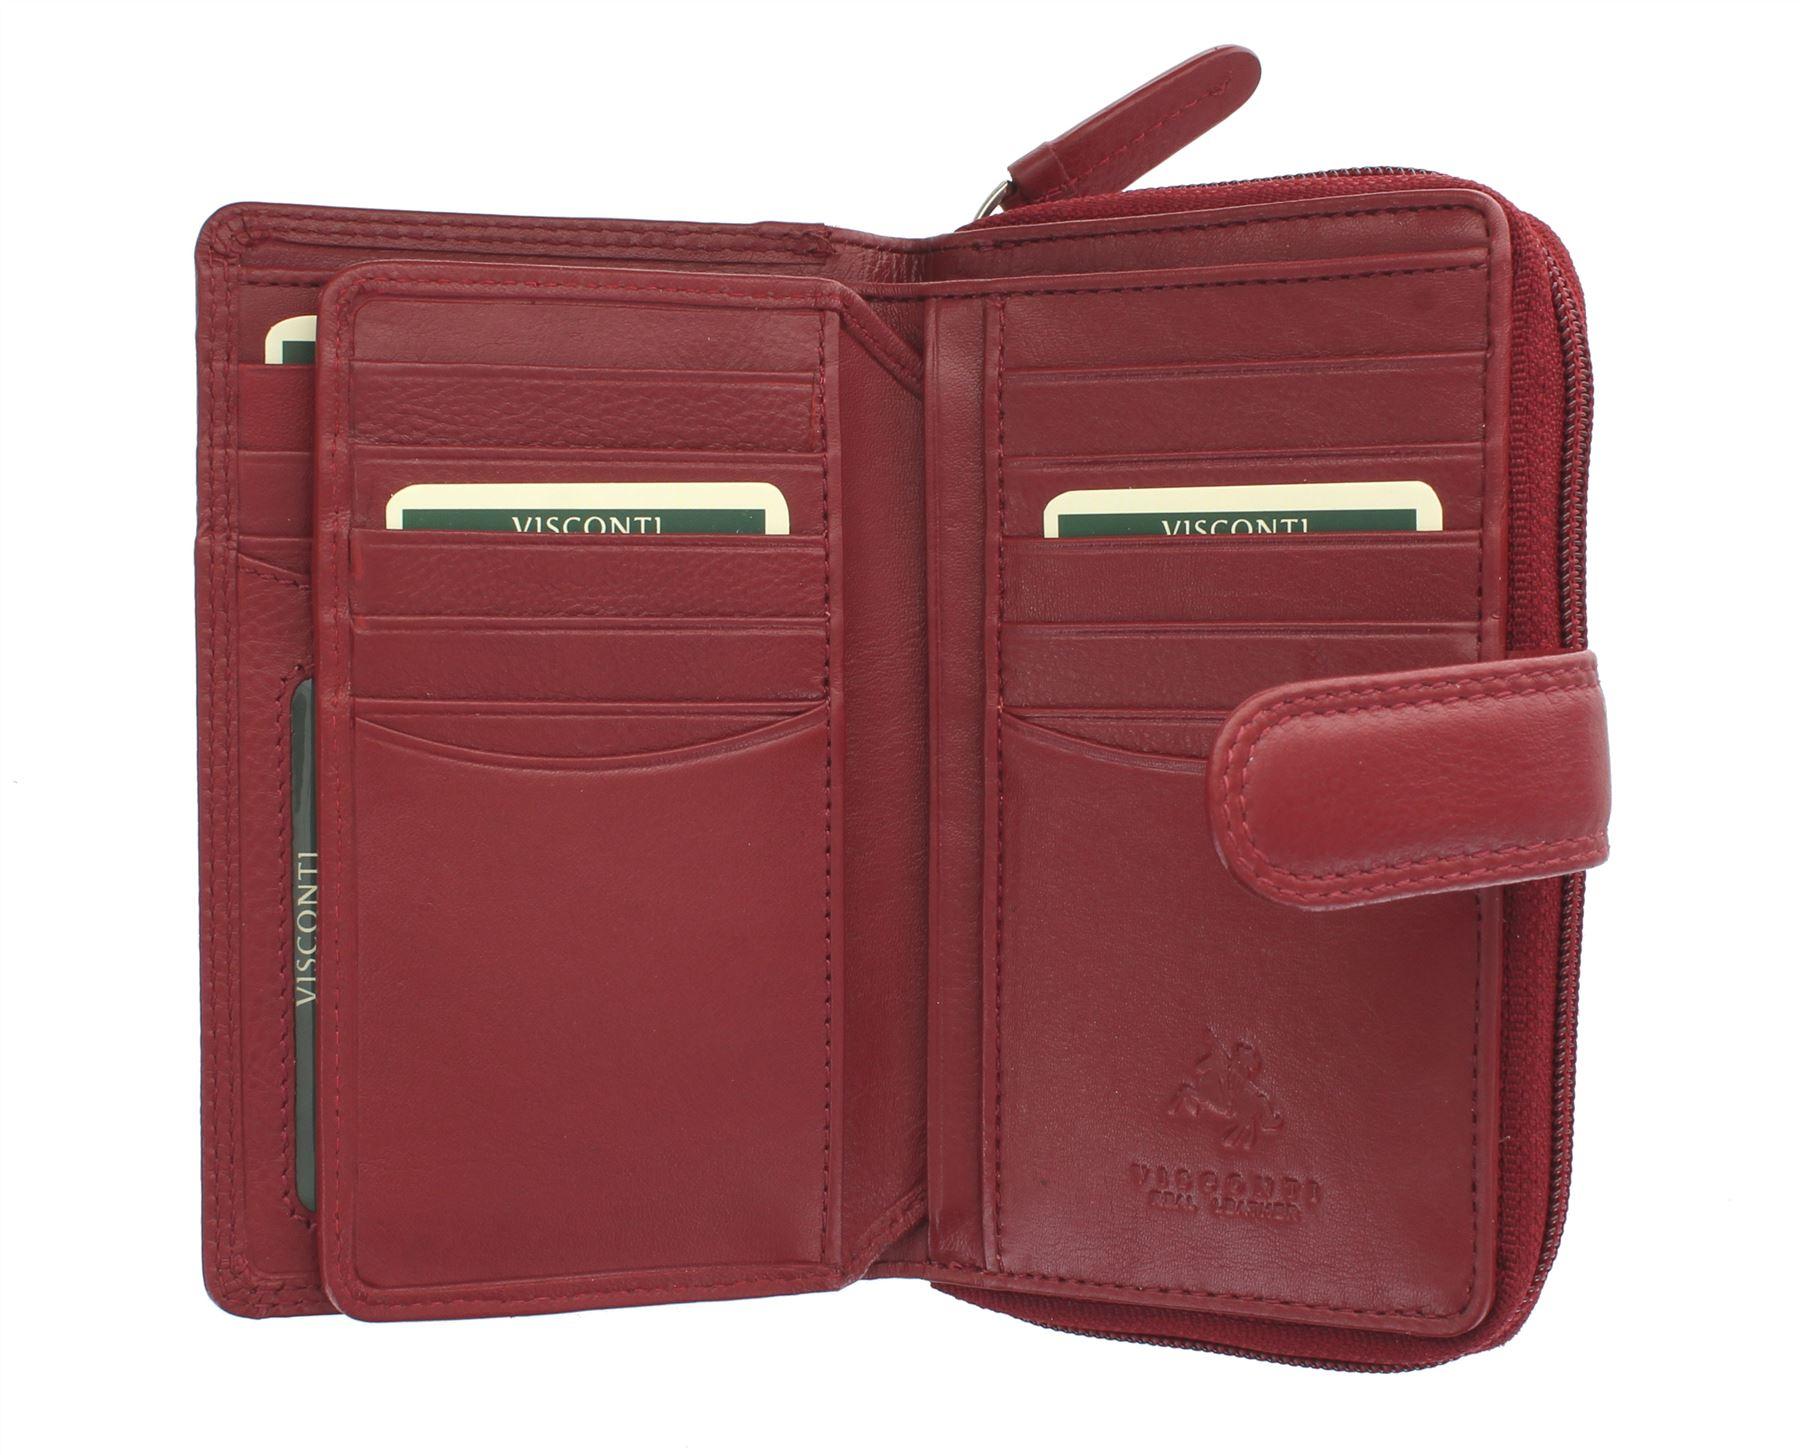 Visconti-Heritage-Collection-MADAME-Leather-Purse-Tab-Closure-RFID-blocking-HT33 miniatura 19